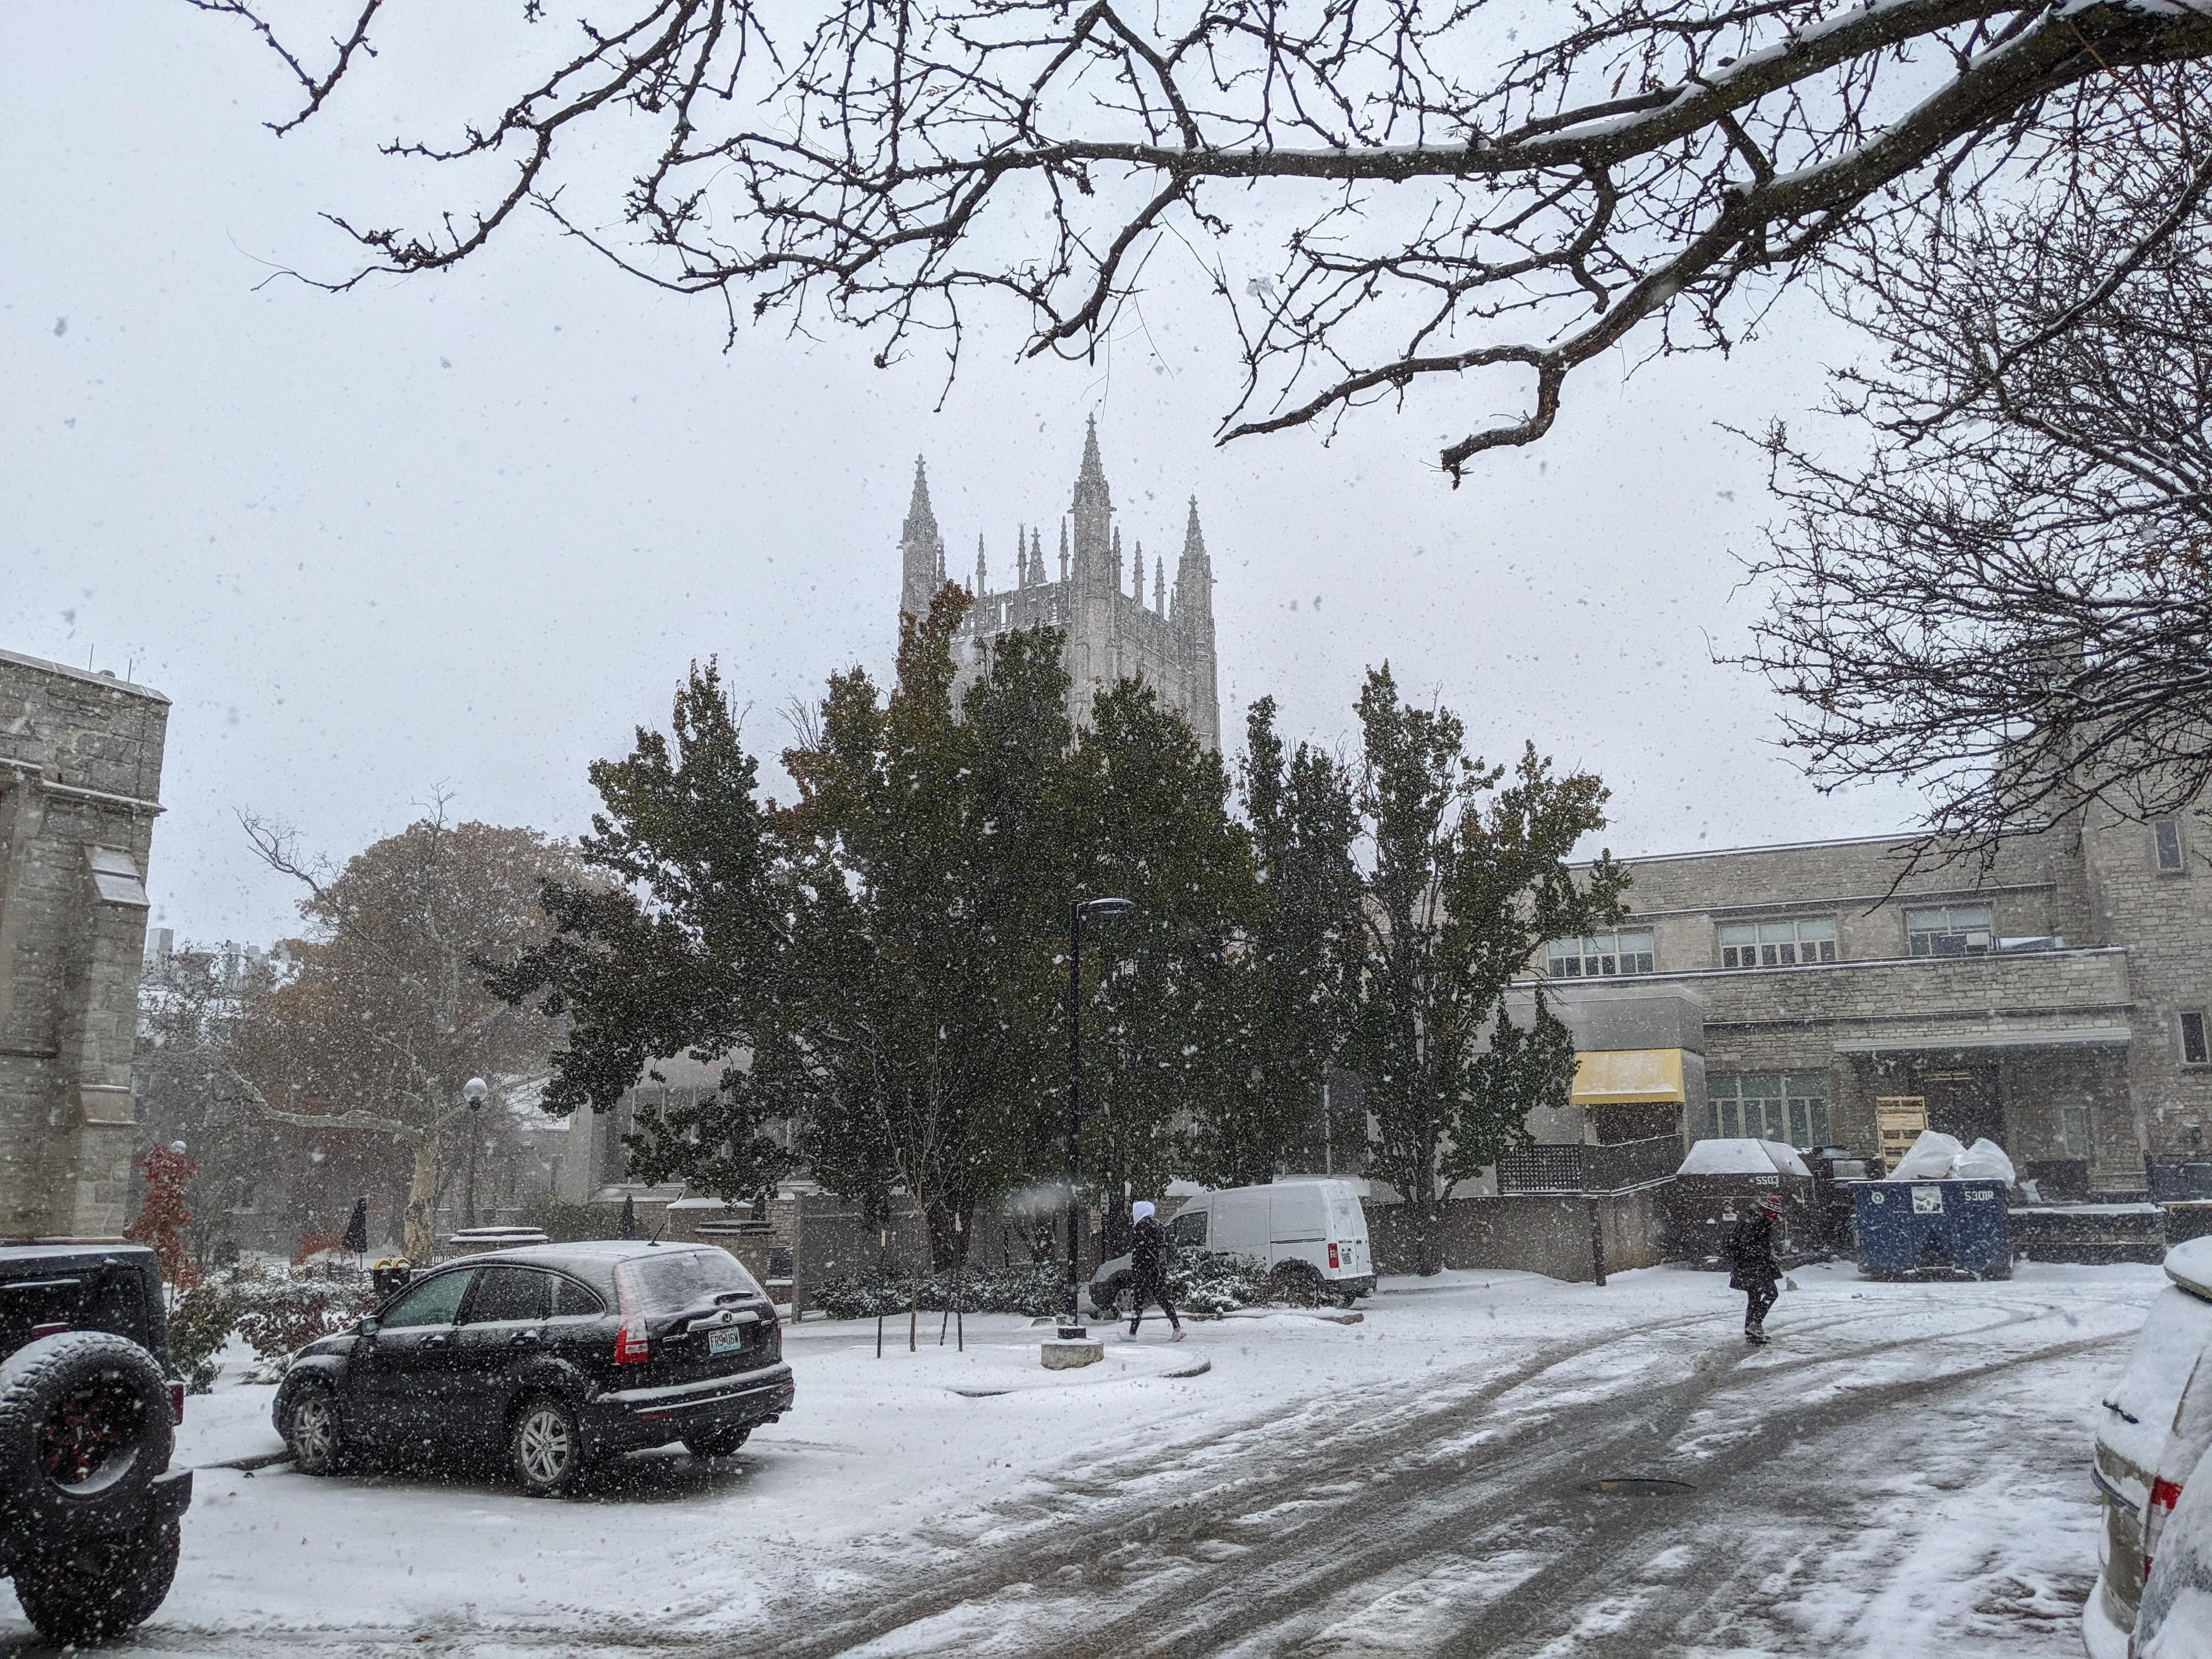 Snow at University of Missouri